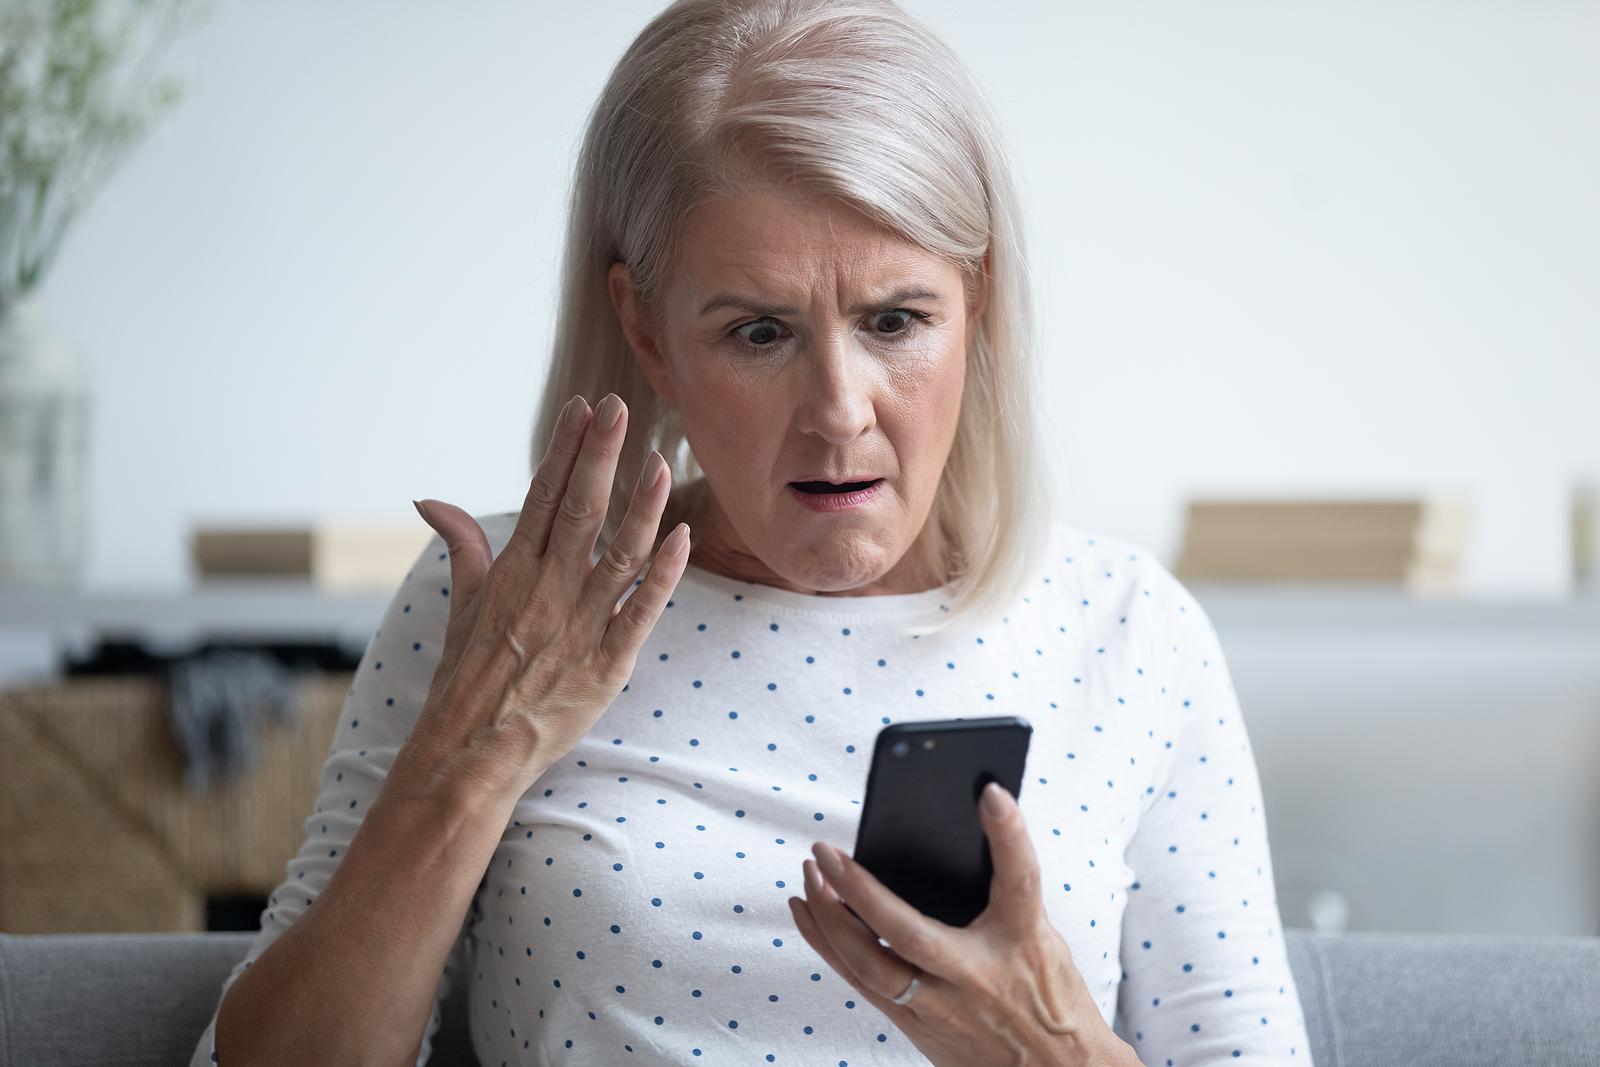 woman-suspicious-of-fraudulent-phone-call